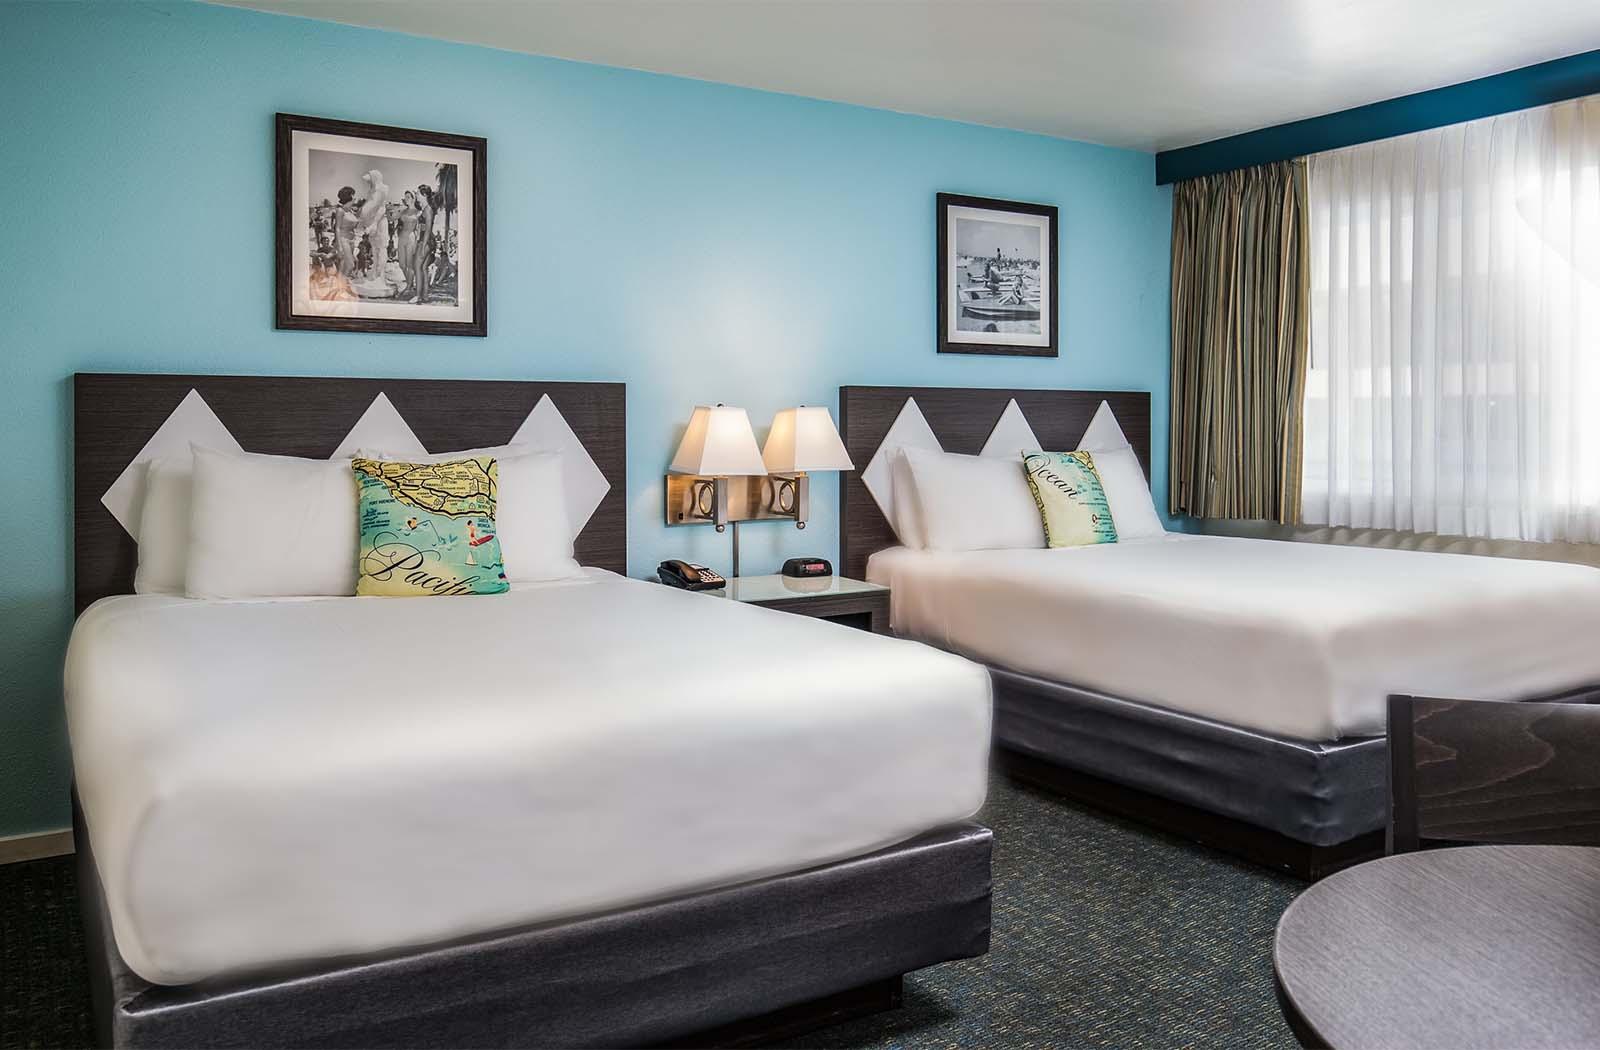 1 Best Value Hotel Rooms And Suites Kings Inn San Diego